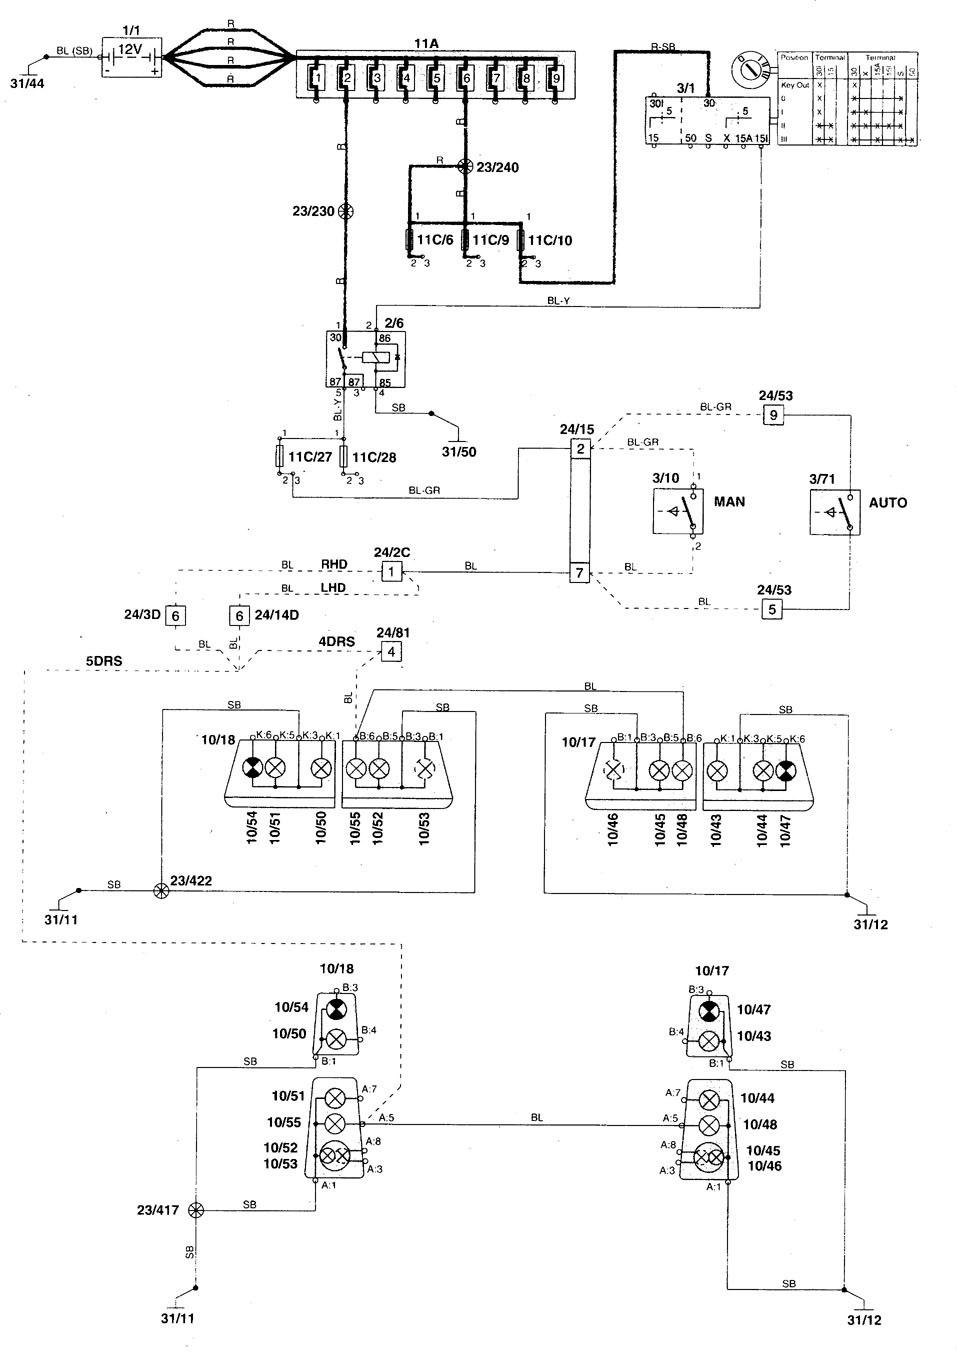 1998 volvo s70 wiring diagram component identification volvo c70 (1998) - wiring diagrams - reverse lamp ... #7